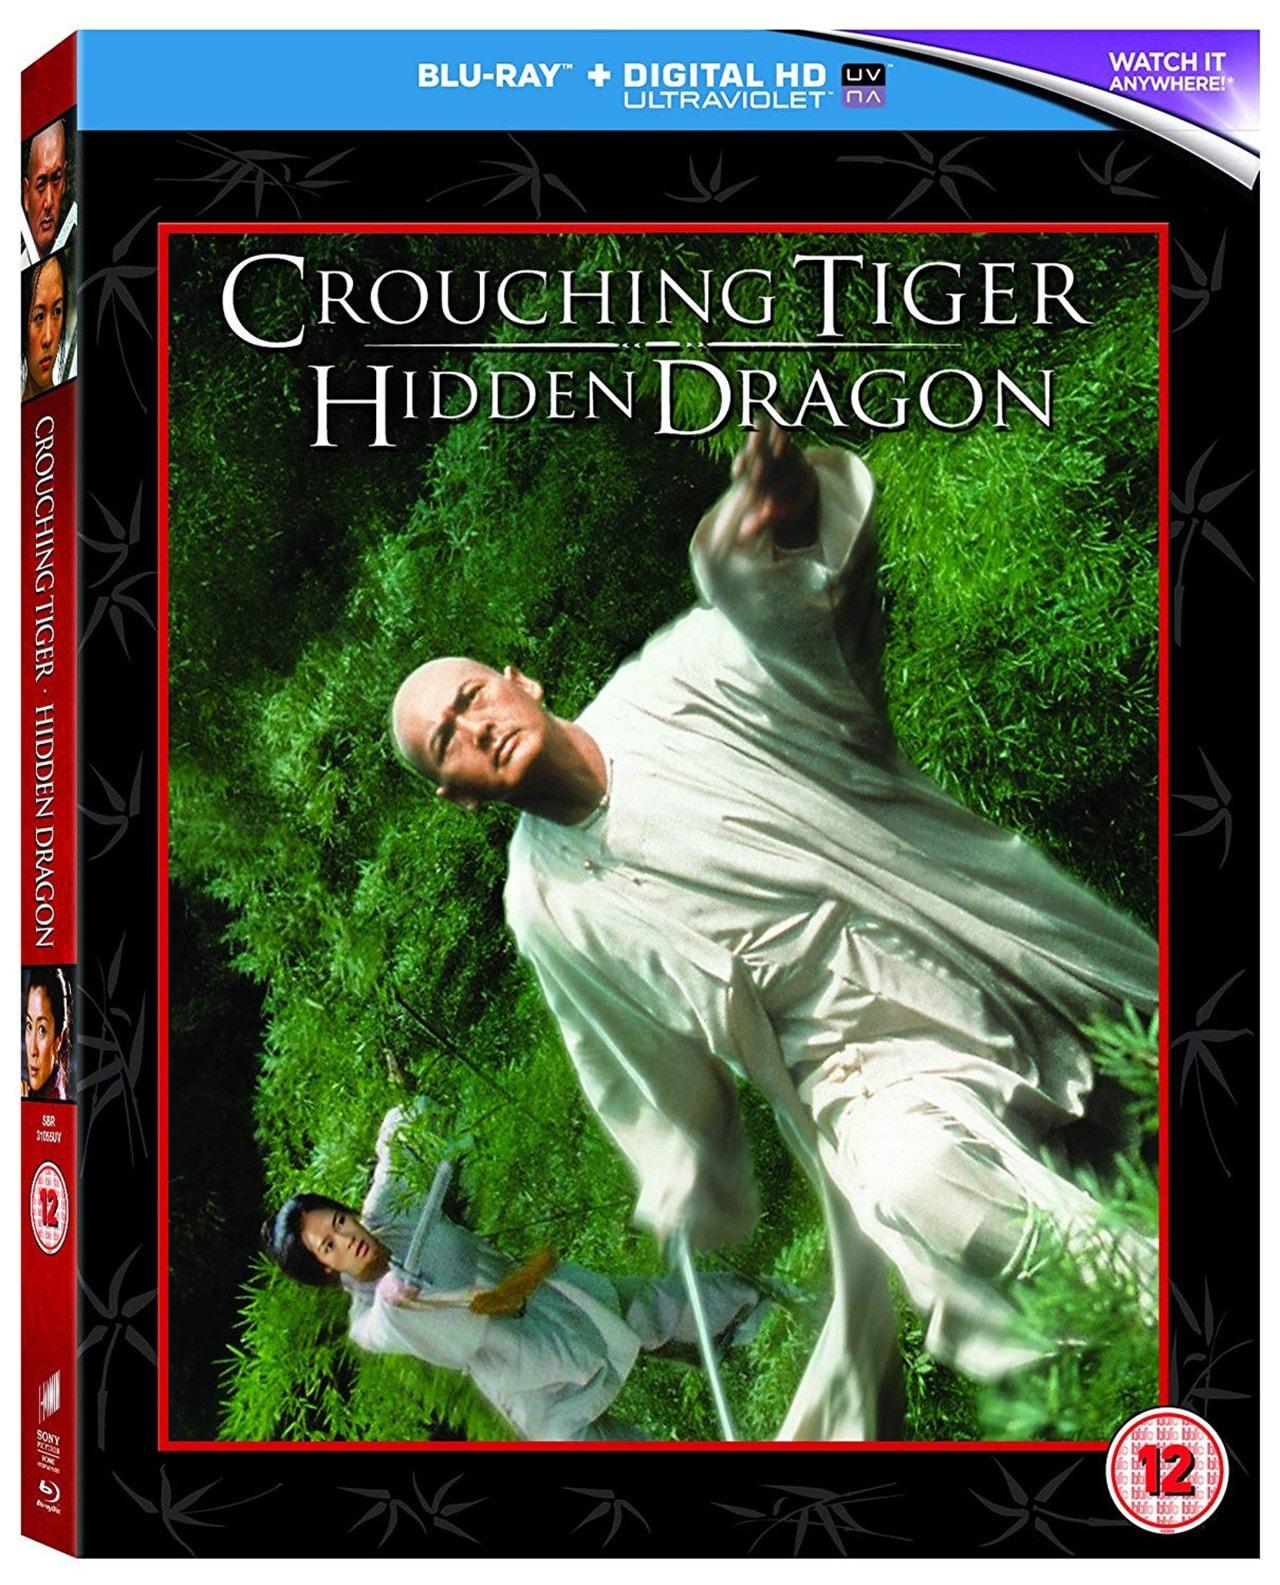 Crouching Tiger, Hidden Dragon - 2